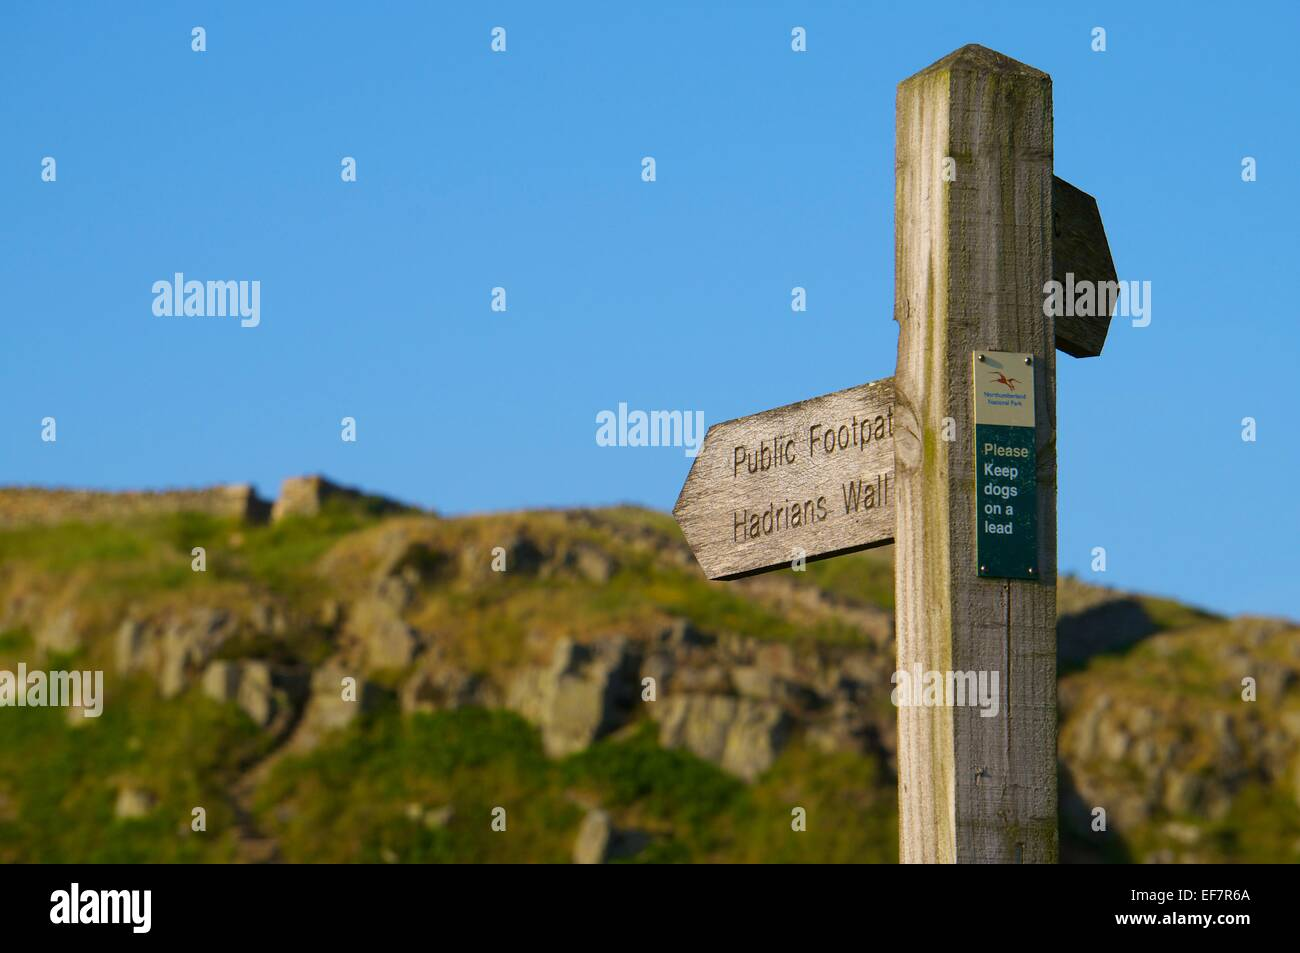 Finger-Wegweiser des öffentlichen Fußweg am Hadrianswall National Trail, Northumberland, England, UK. Stockbild